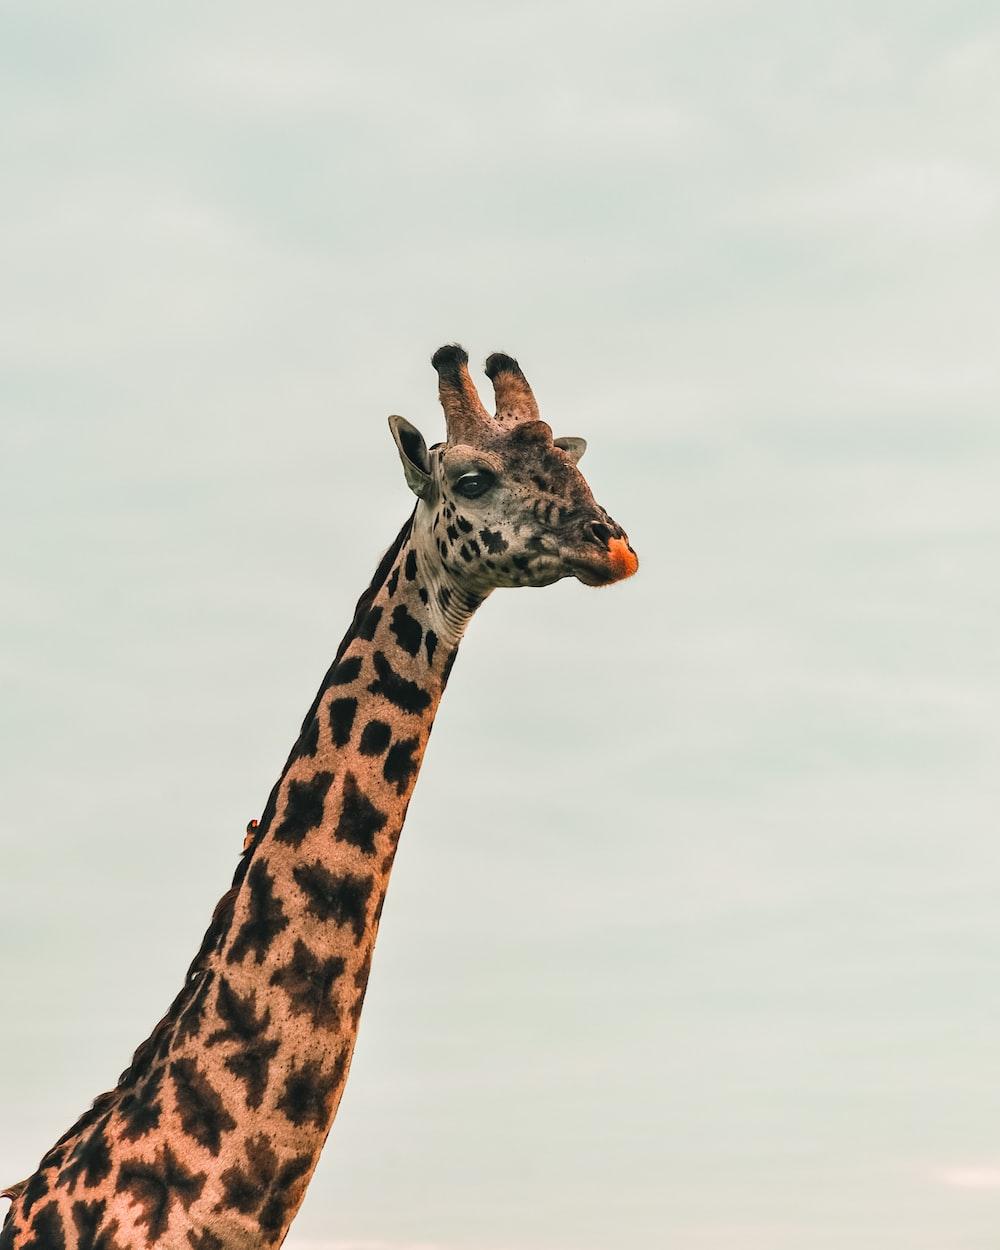 brown and black giraffe under white sky during daytime